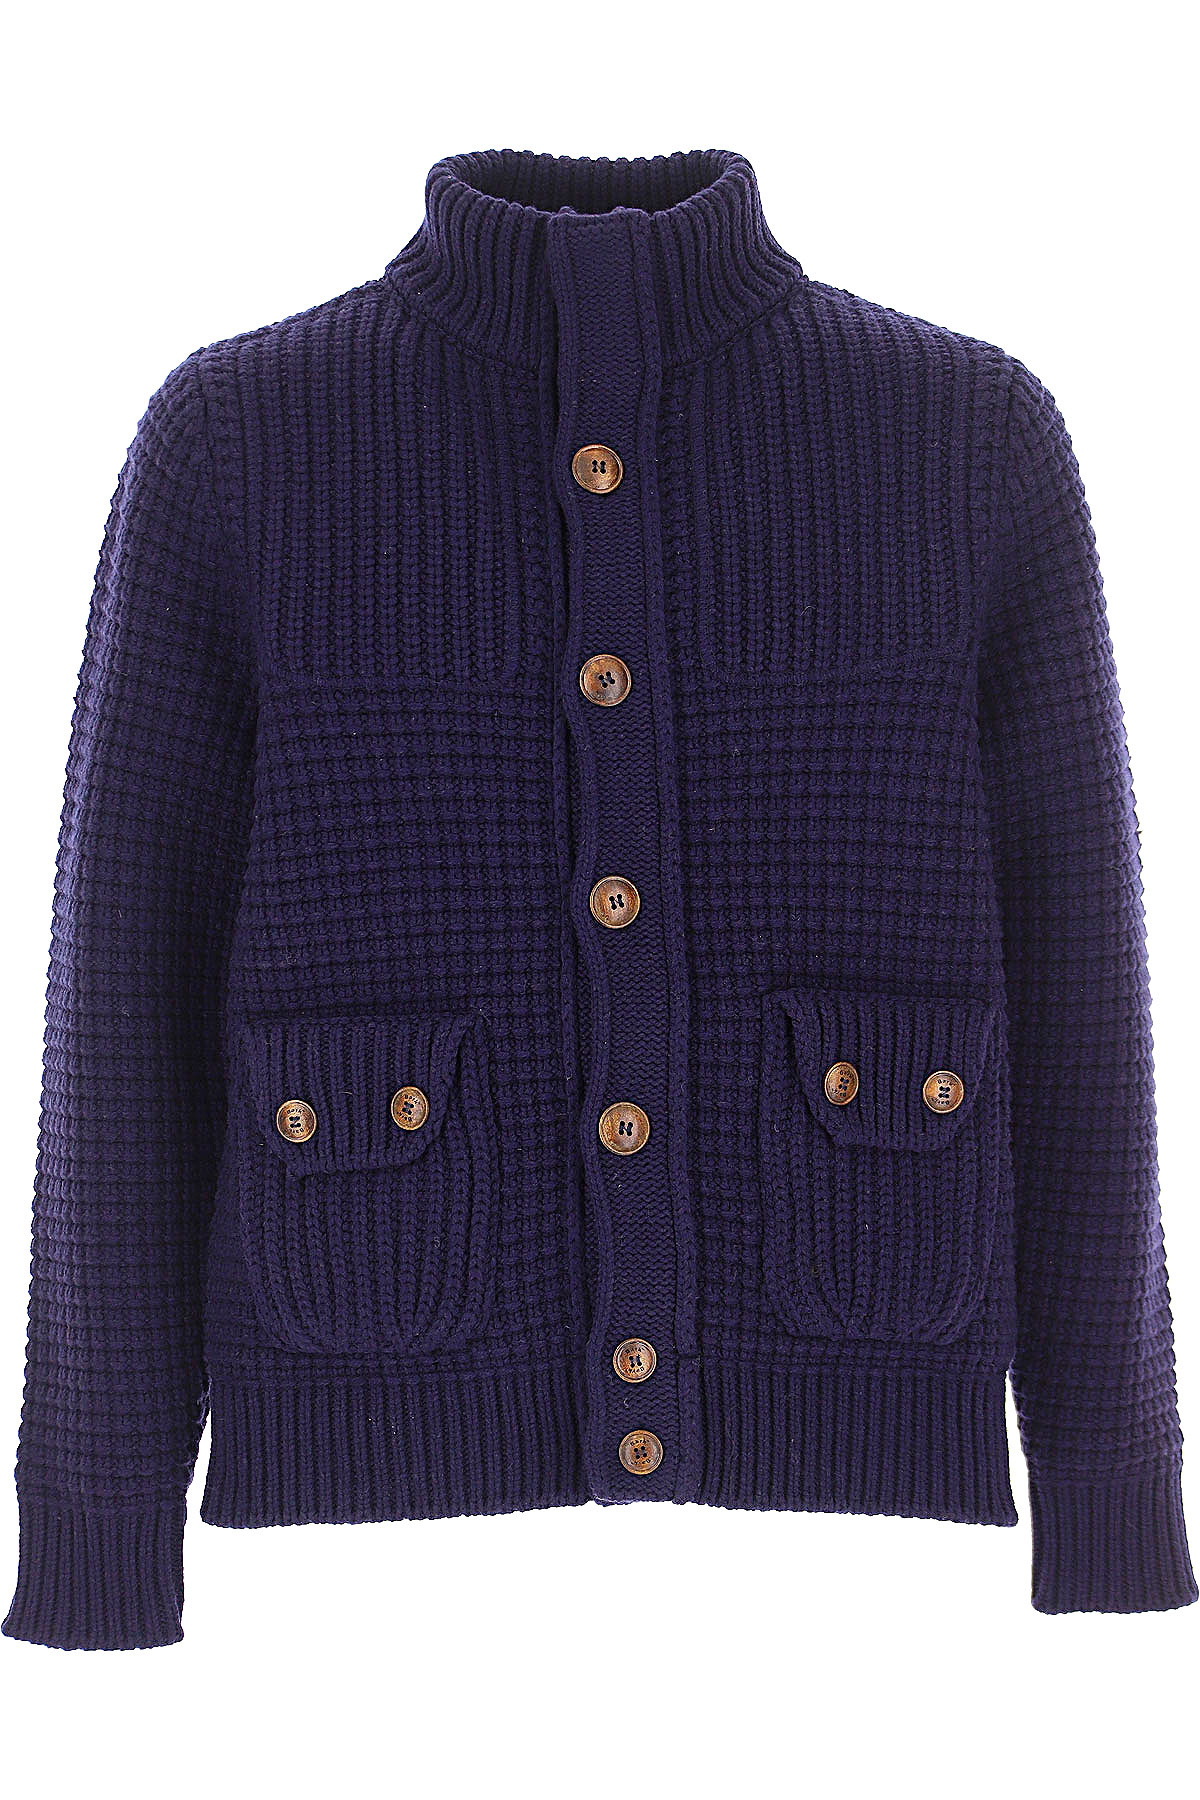 Bark Sweater for Men Jumper On Sale, navy, Wool, 2019, XL XXL